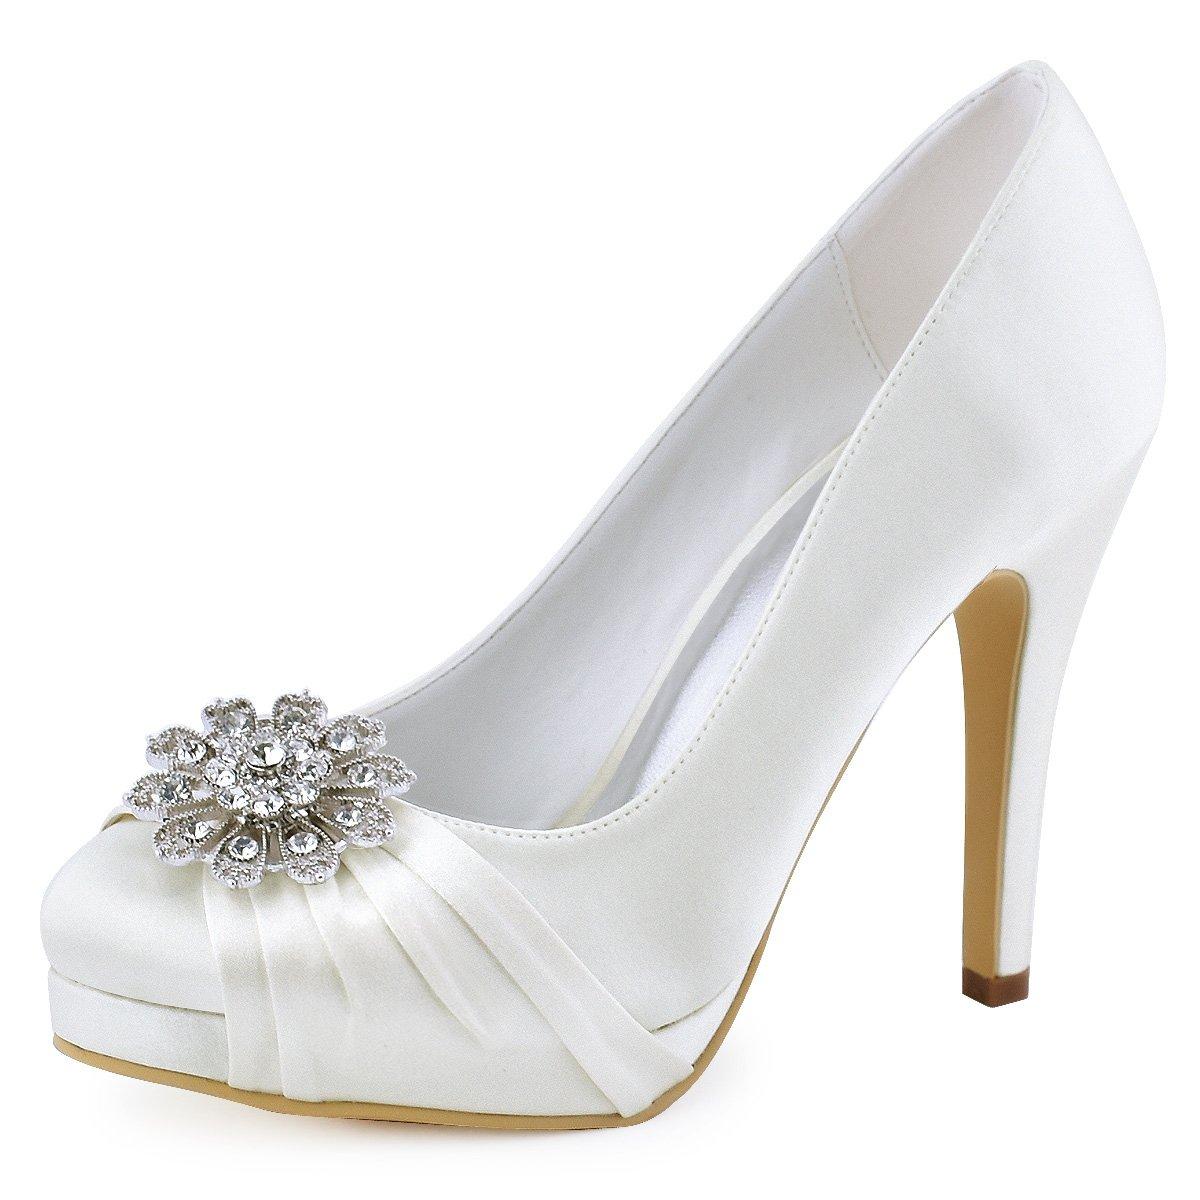 86bd9d31cc Elegantpark EP2015-PF Mujeres Bombas Punta Cerrada Zapatos Plataforma Zapatos  Tacón Alto Rhinestones Satén Wedding